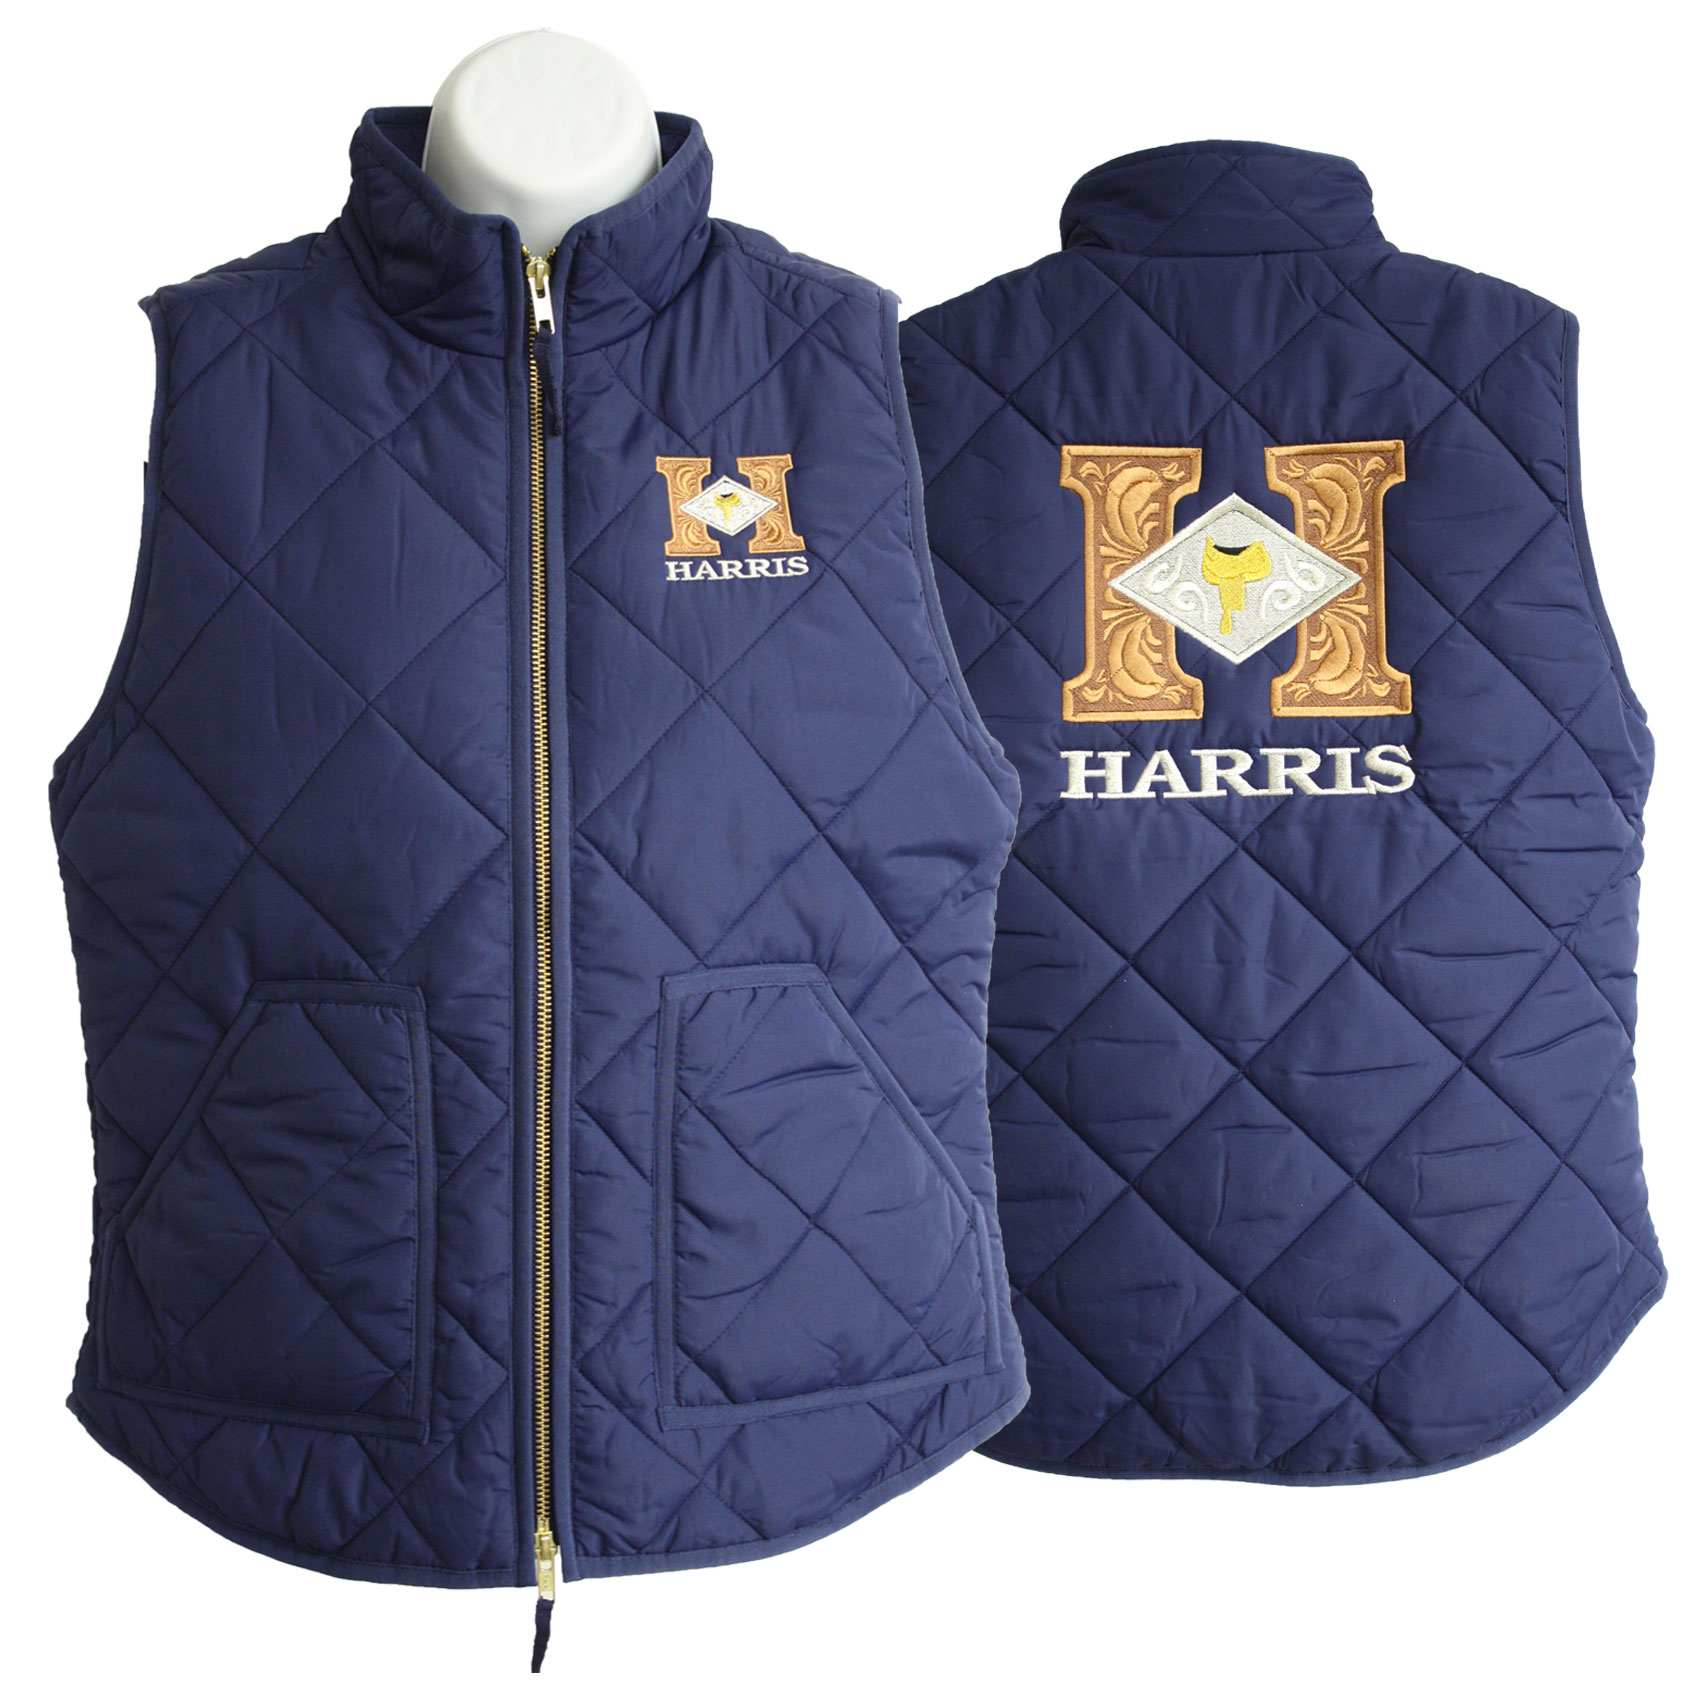 Crew Quilted Vest – Navy | Harris Leather & Silverworks ... : quilted vest navy - Adamdwight.com